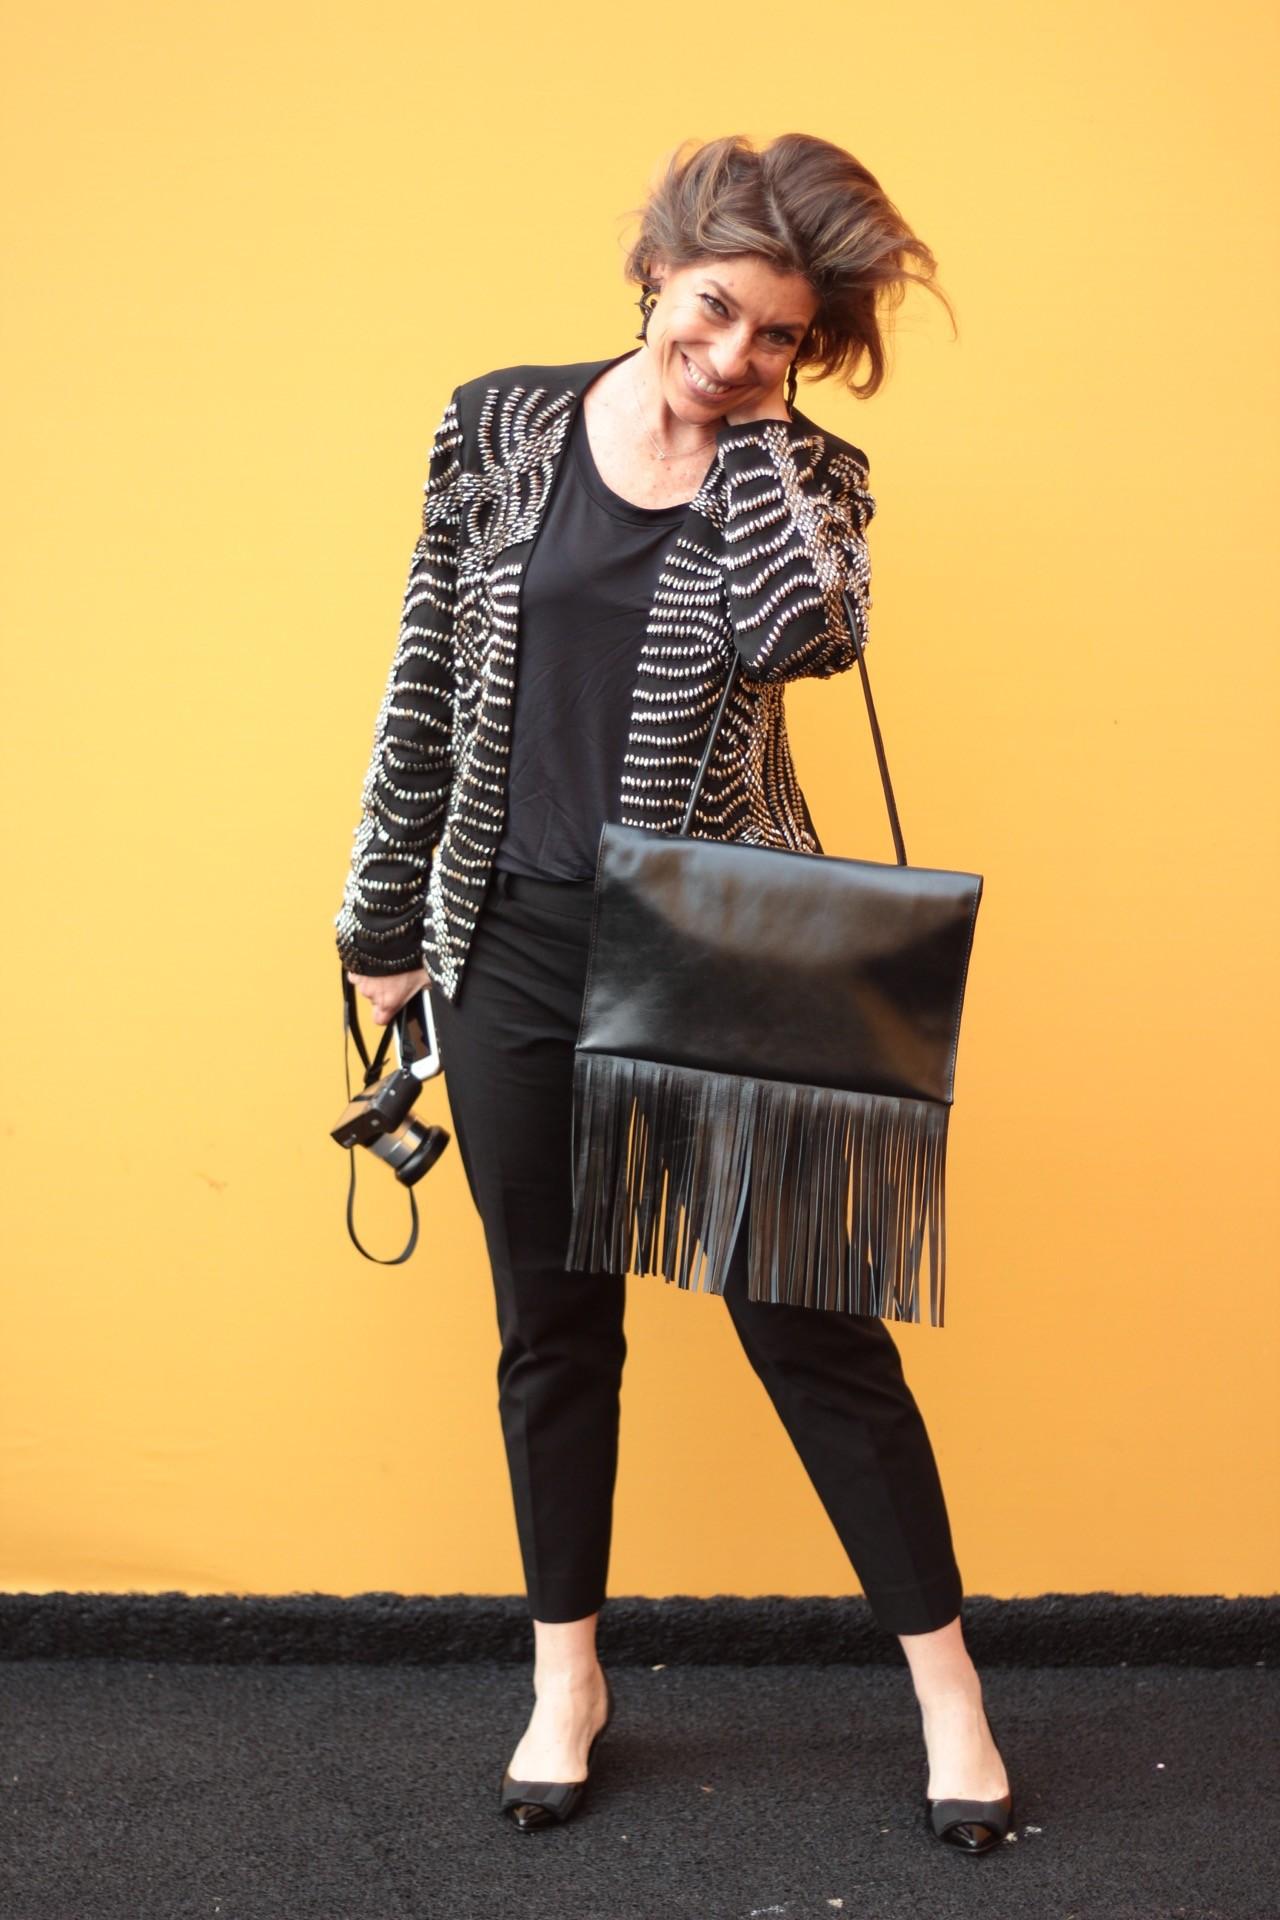 Esse look, mais romantic rock 'n' roll, tem jaqueta Carmen Steffens, sapatos Corello e carteira Torus!! Foto @2mixxphoto